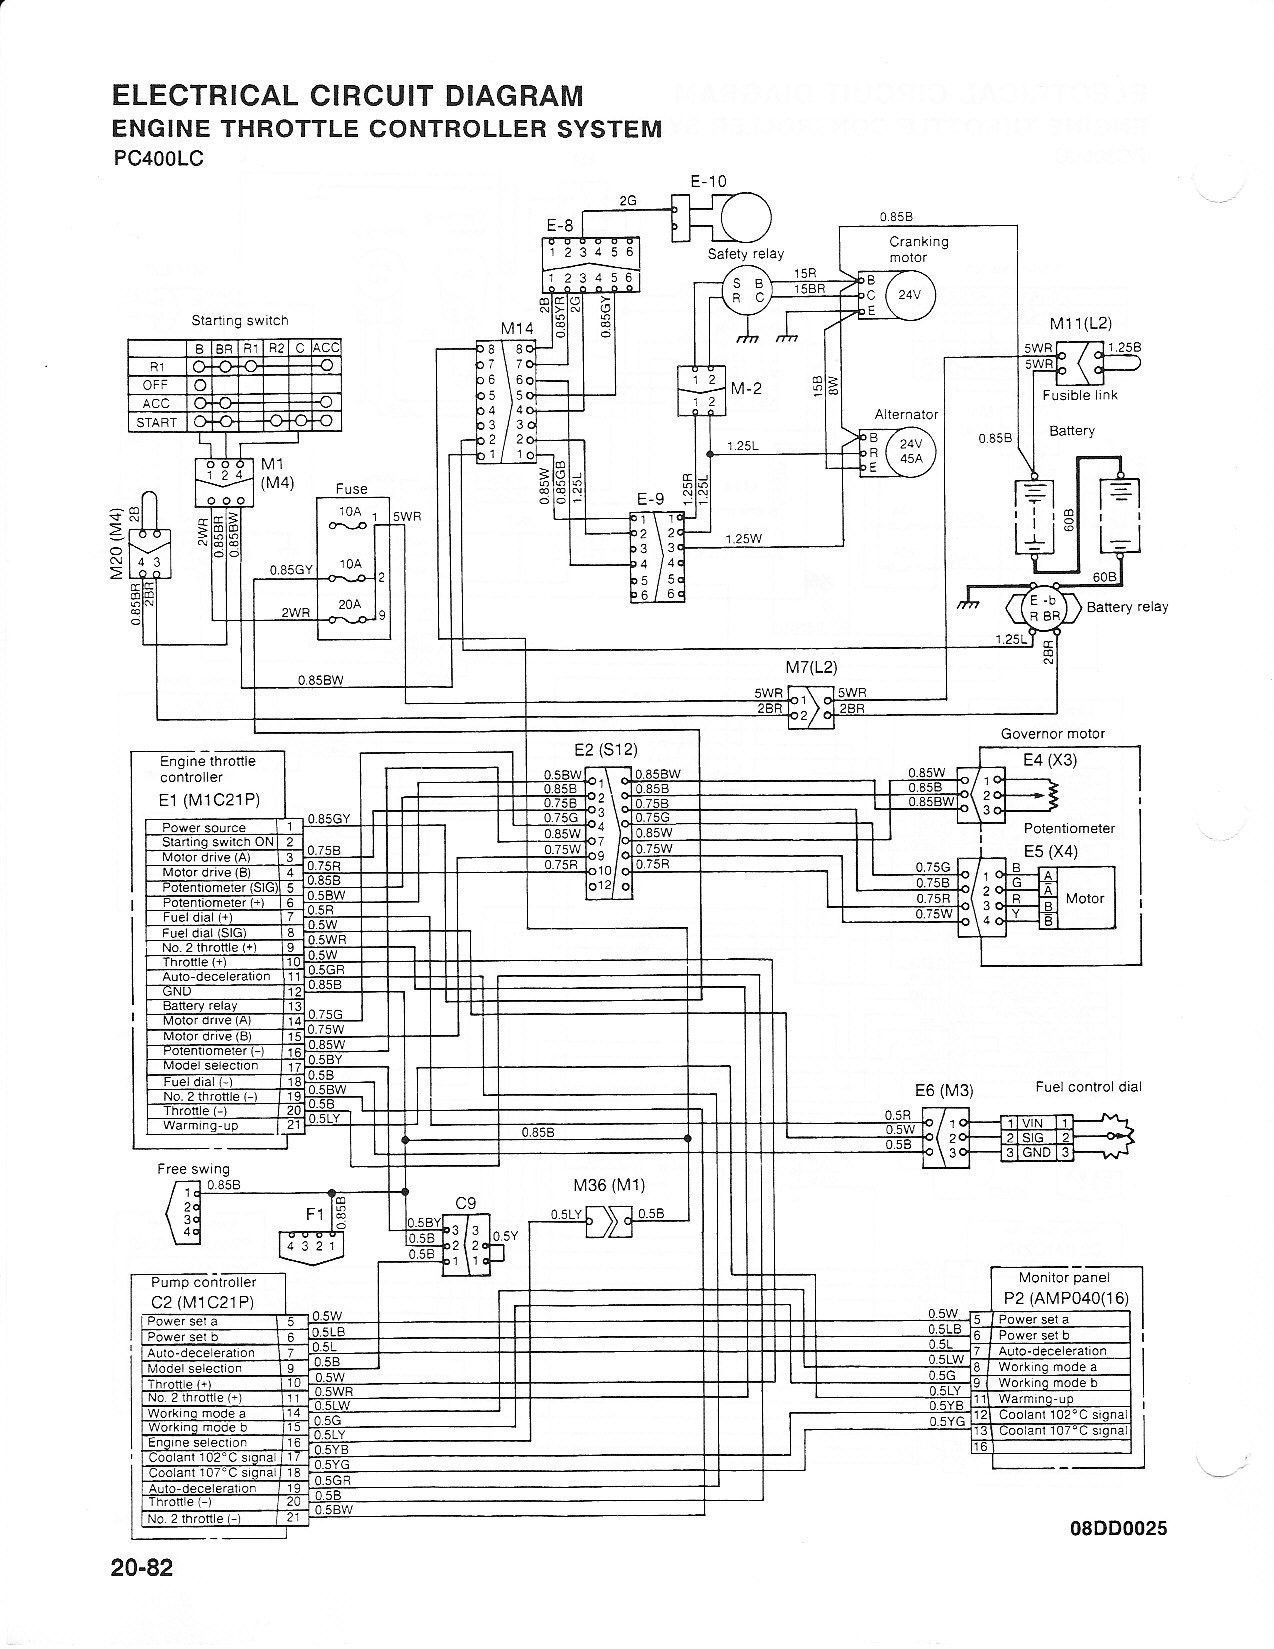 New Freightliner Speedometer Wiring Diagram In 2020 Diagram Freightliner About Me Blog